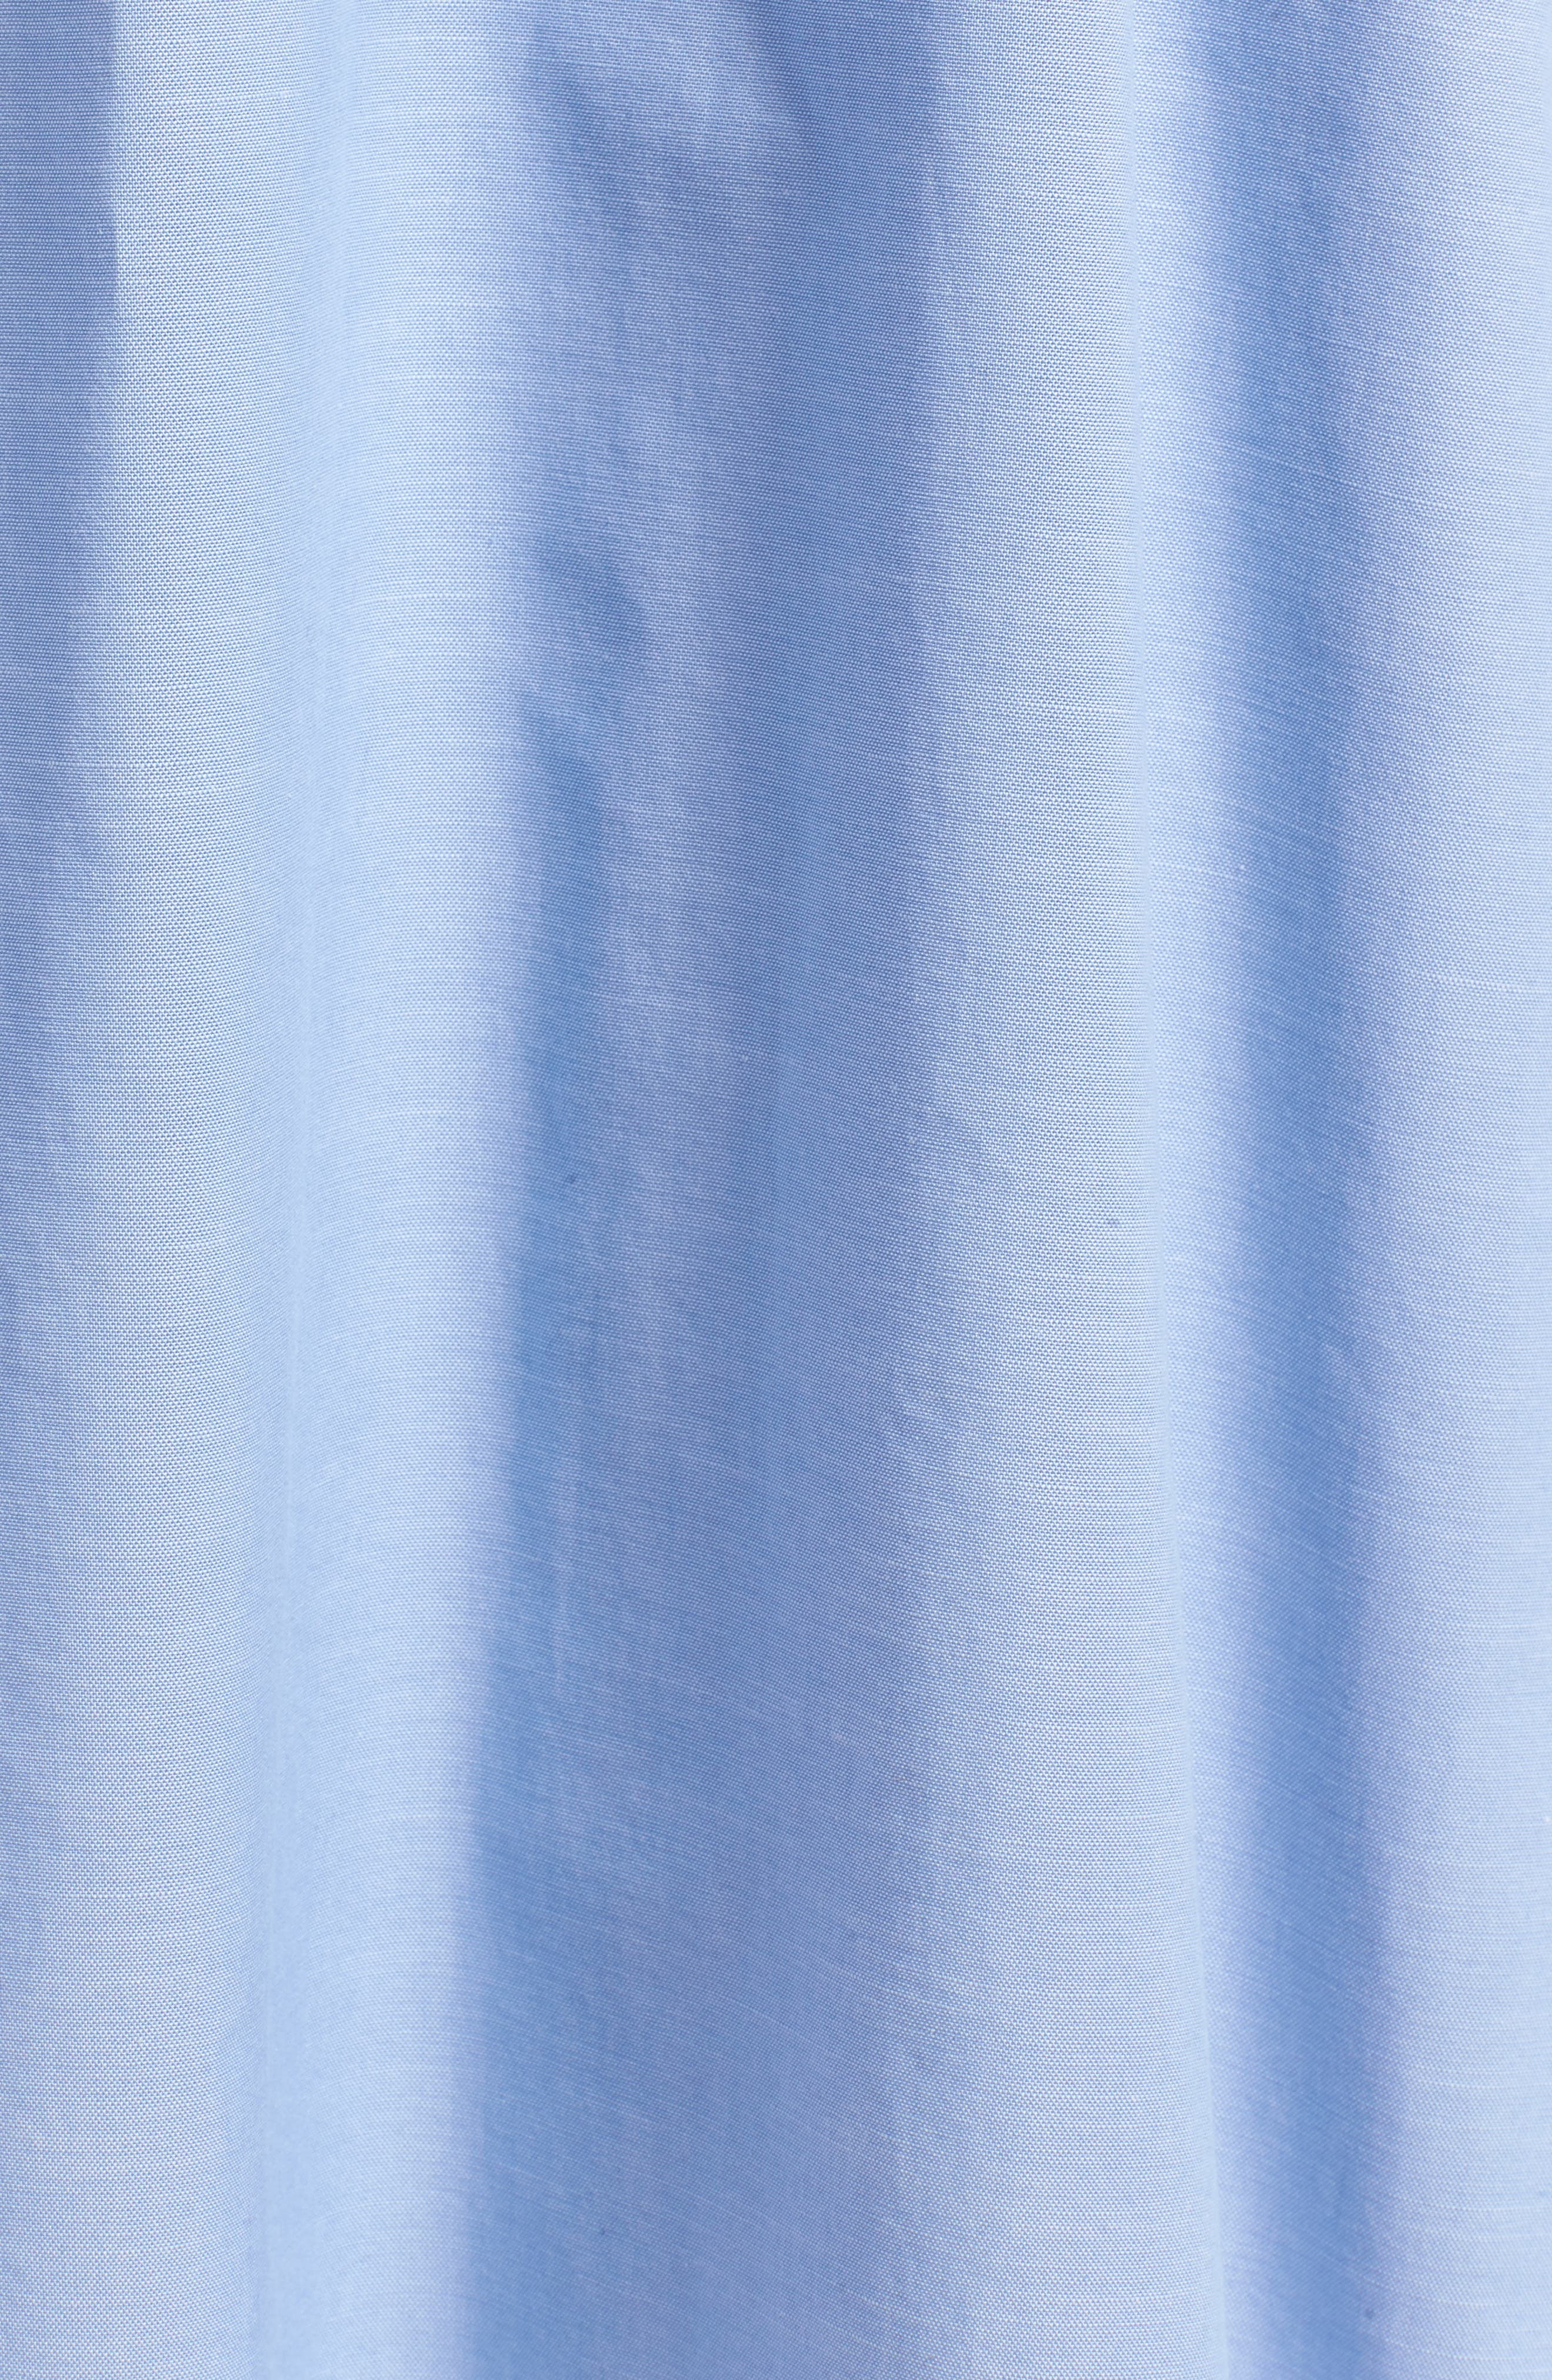 Chambray Wrap Dress,                             Alternate thumbnail 6, color,                             420